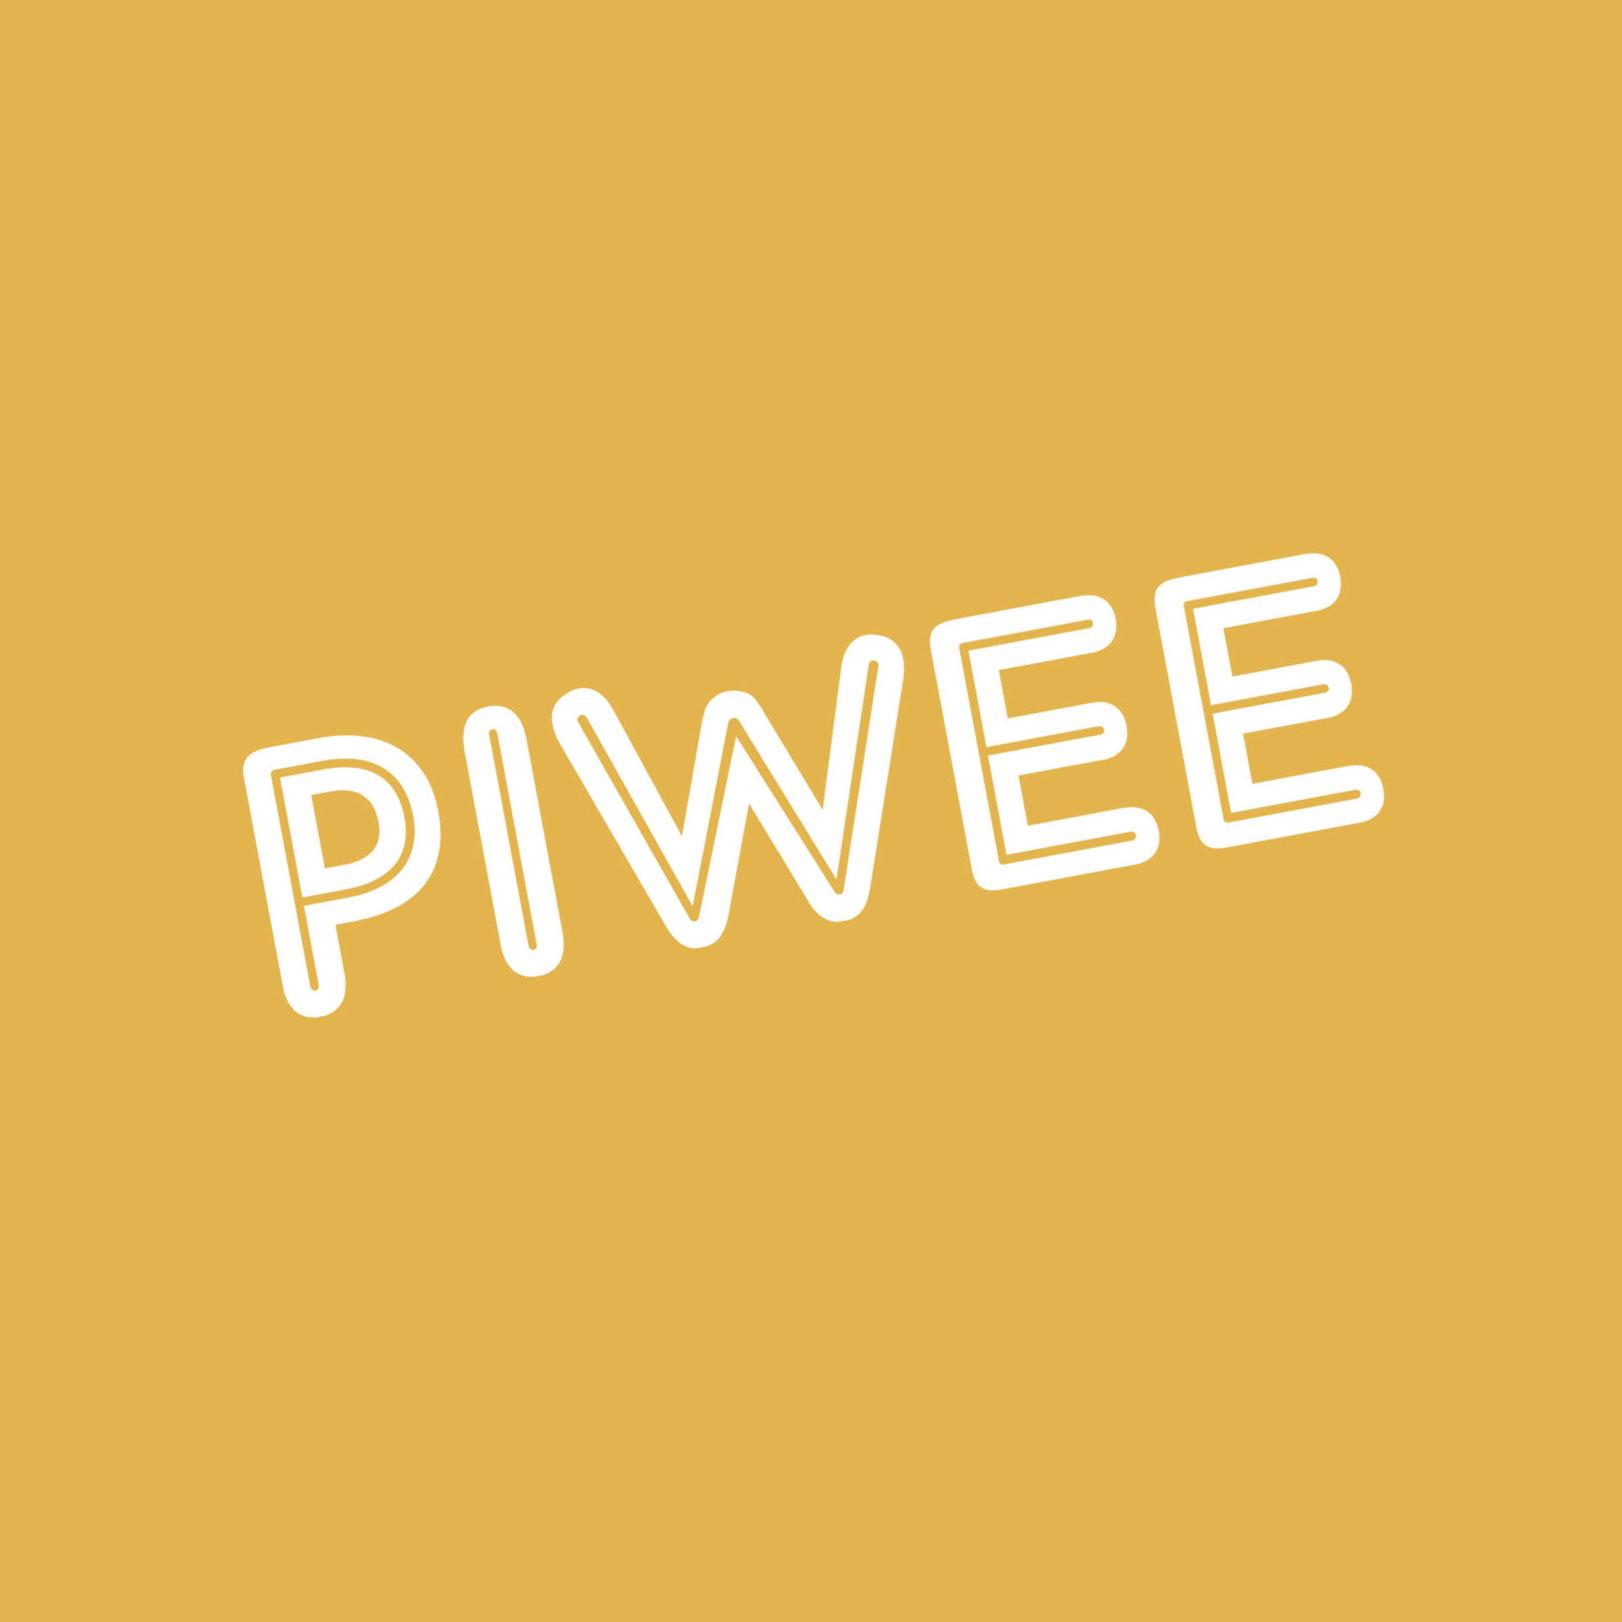 Avatar - Piwee